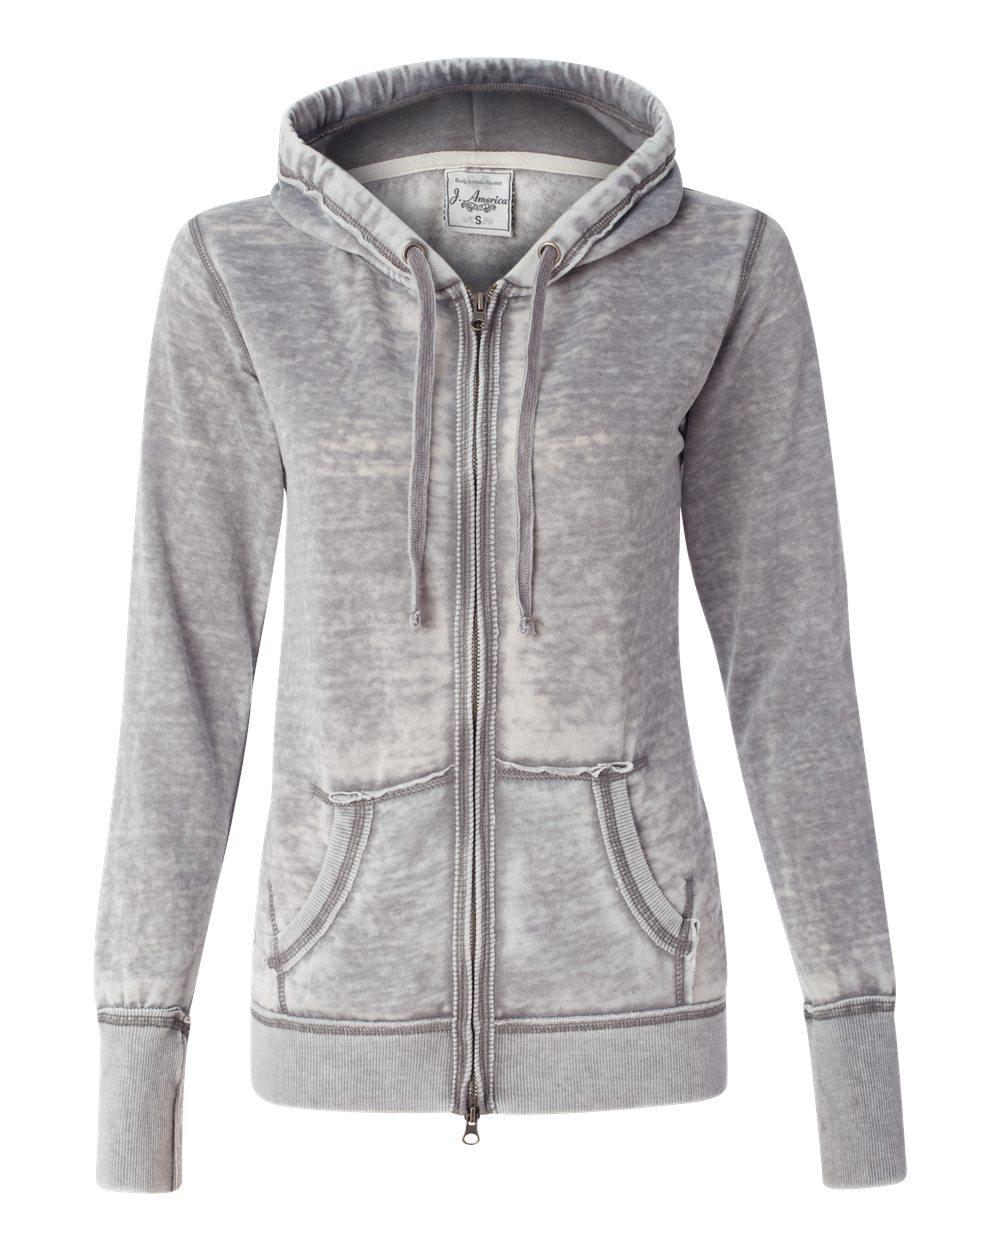 d3559072102a Ladies Fleece Lined Sweatshirt - BCD Tofu House